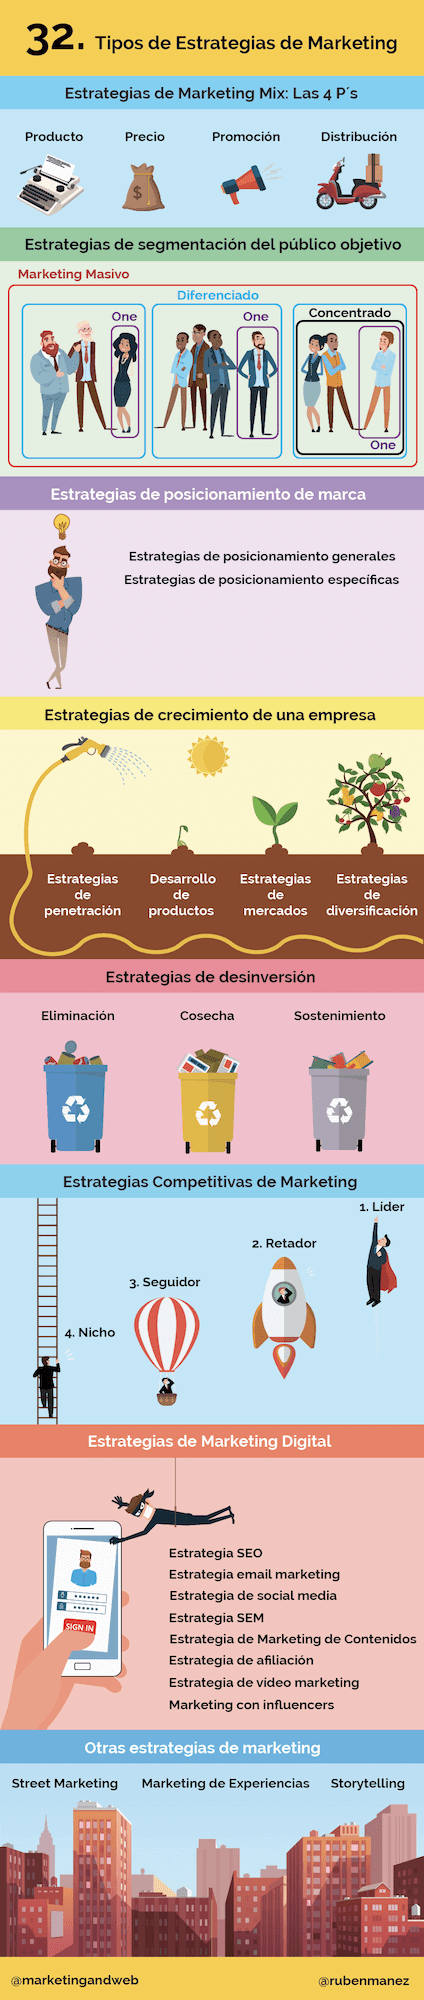 infografía tipos de estrategias de comunicación